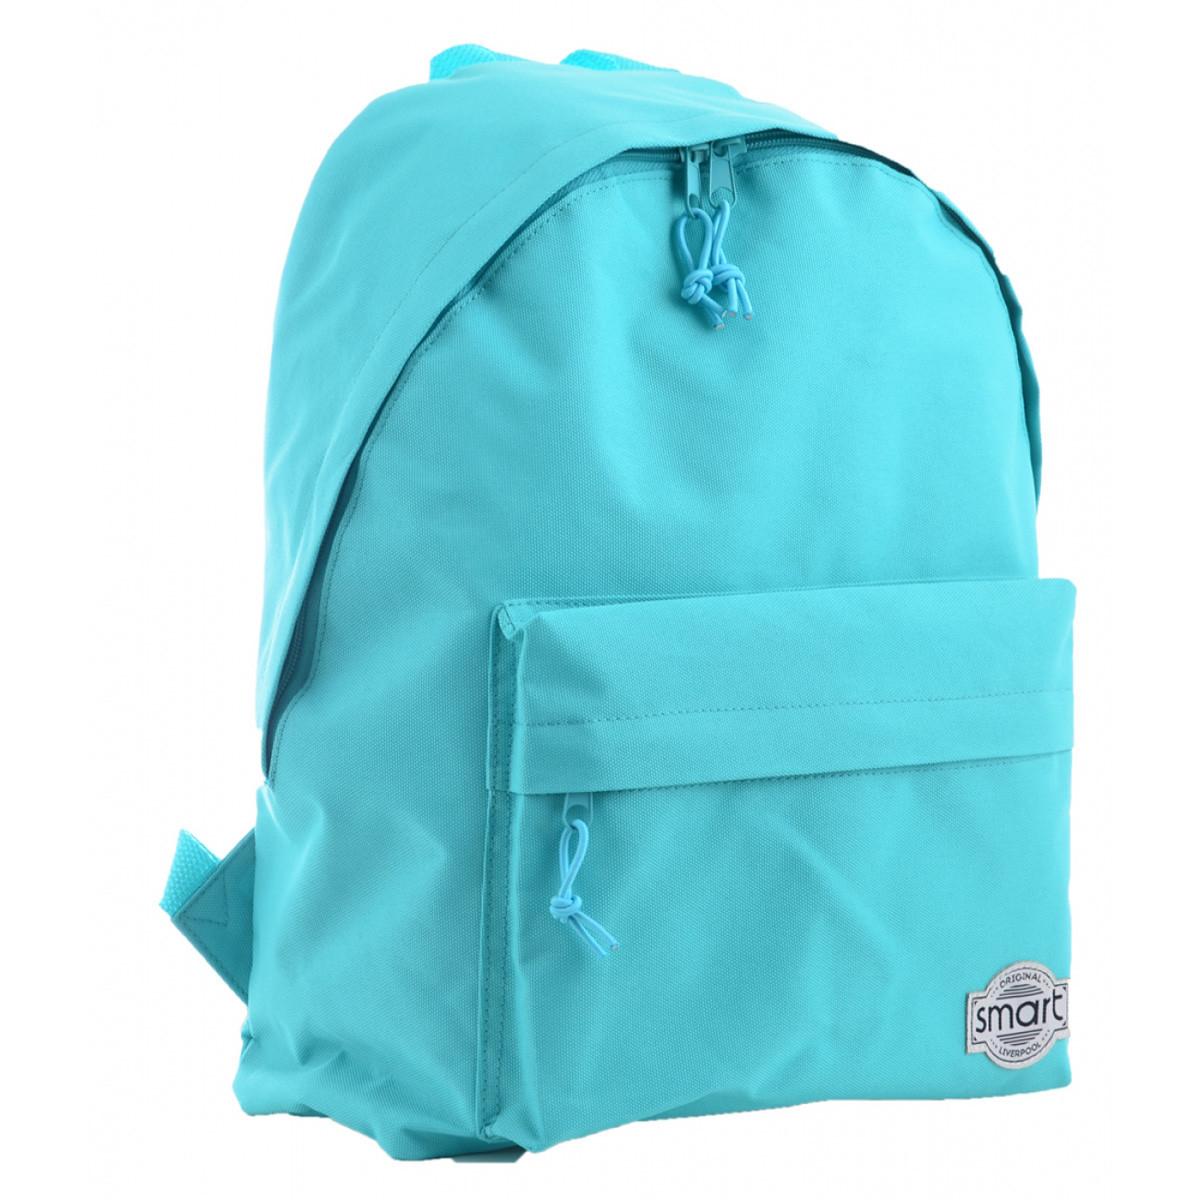 Рюкзак молодежный Smart ST-29 Aquamarine, 37*28*11 555383